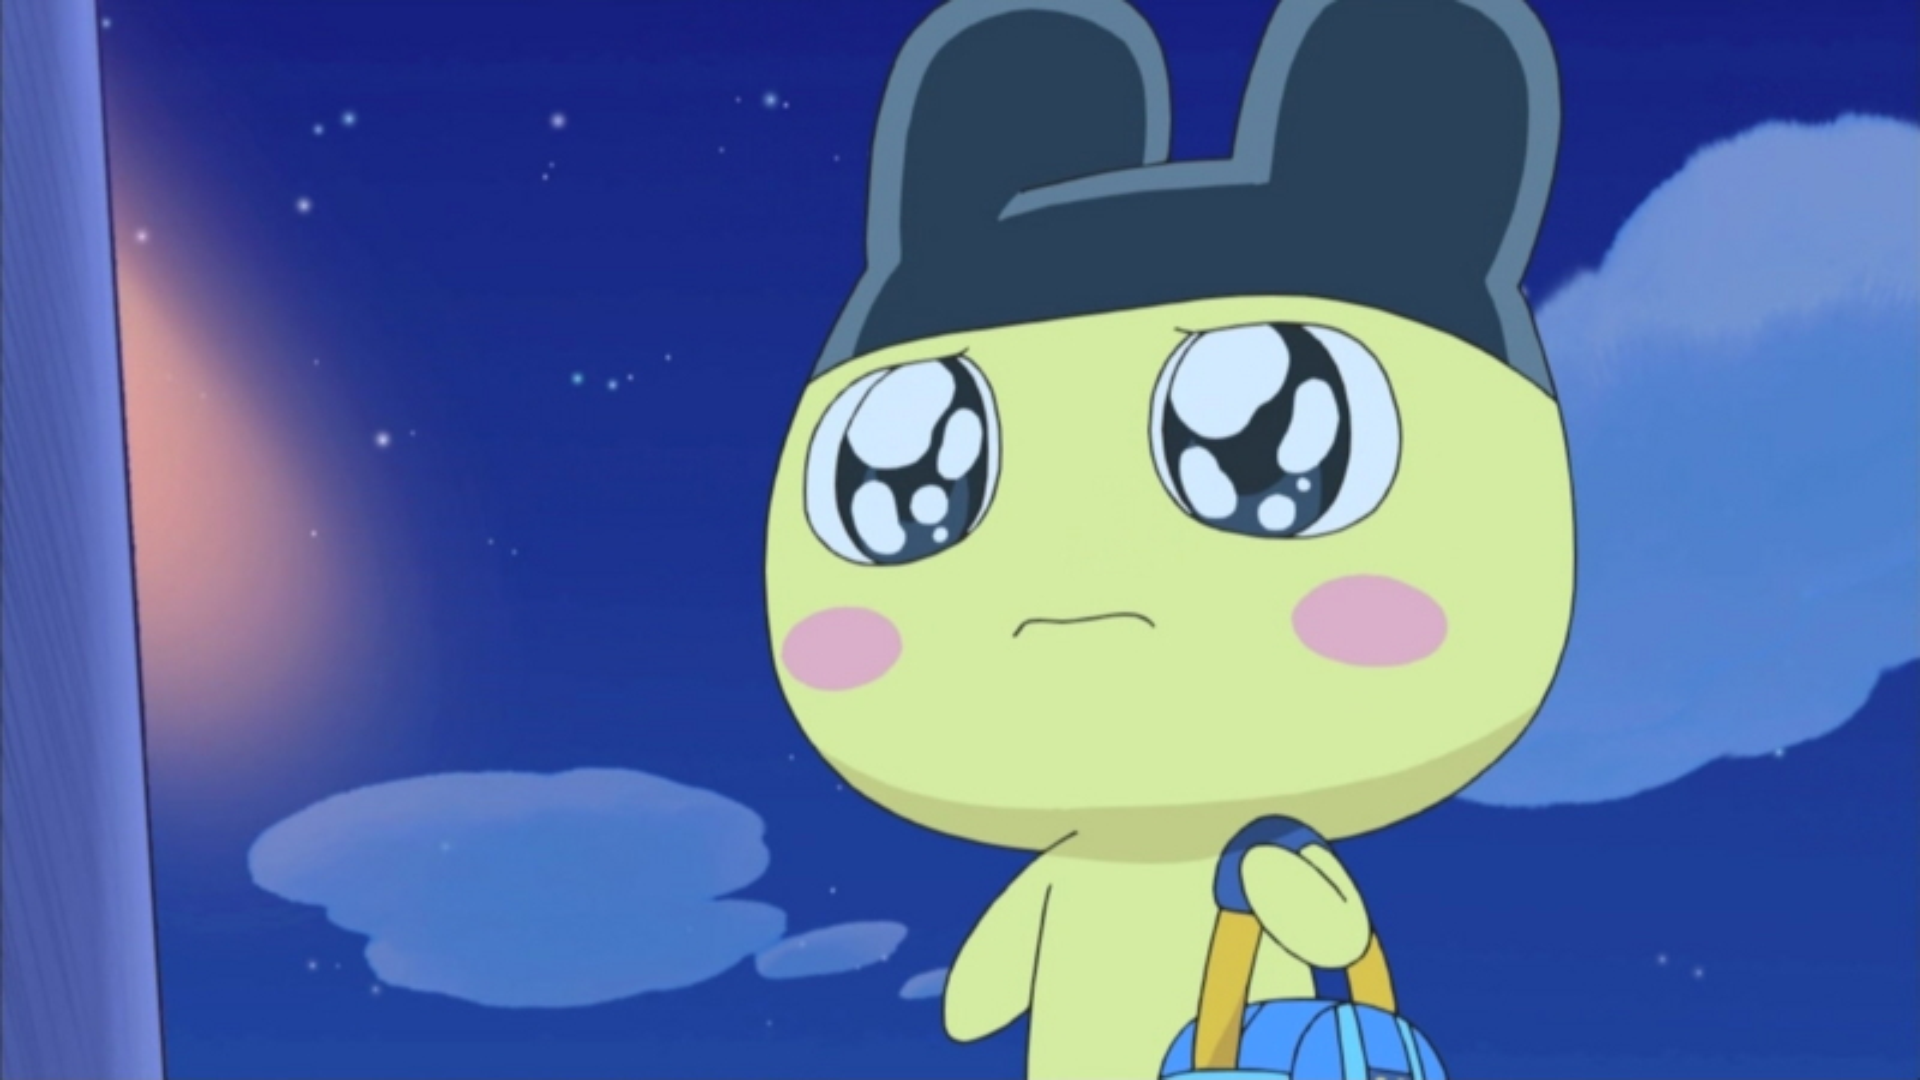 Tamagotchi Yume Kira Dream Episode 7